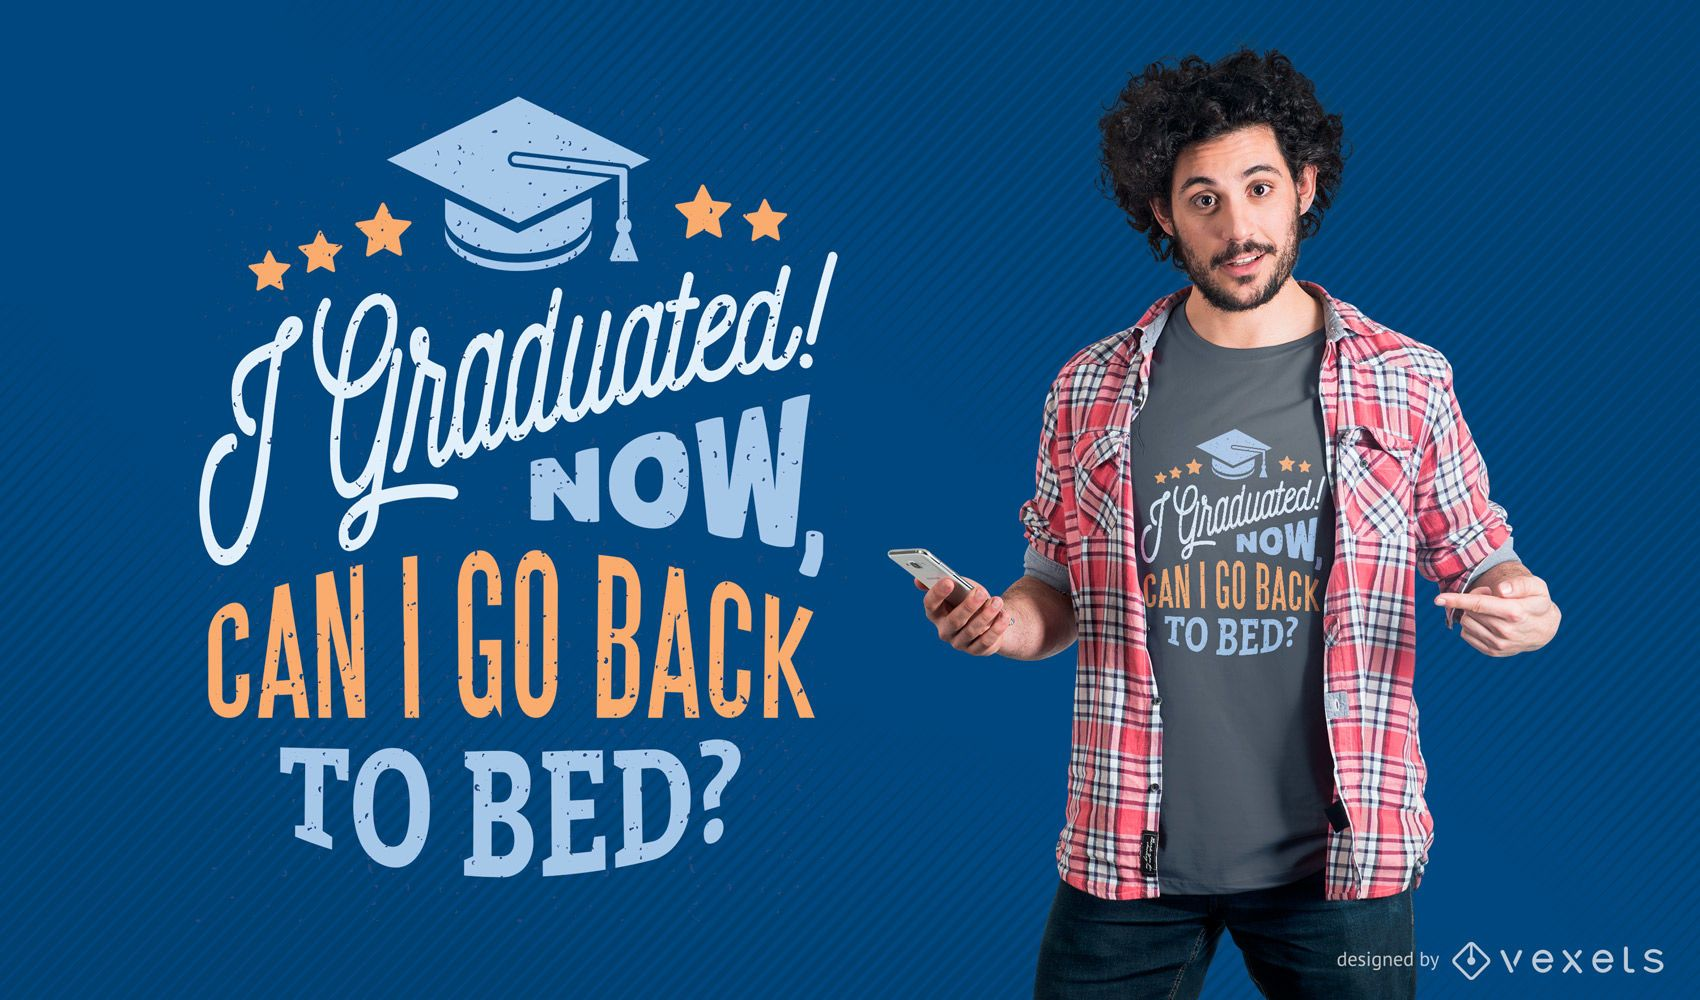 Funny graduation t-shirt design